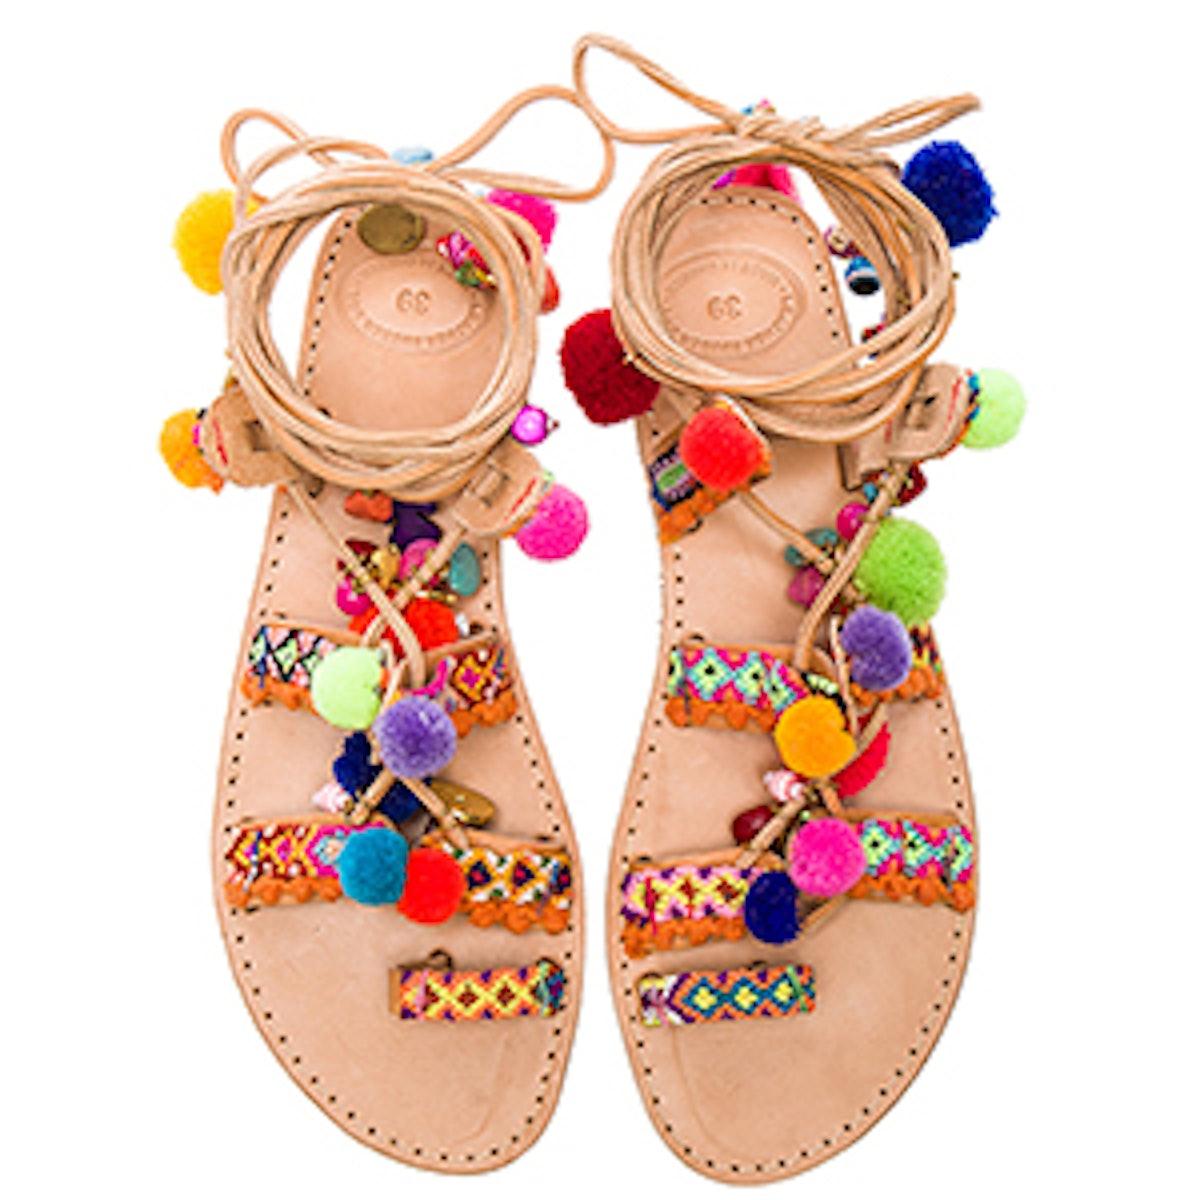 Penny Lane Leather Sandal